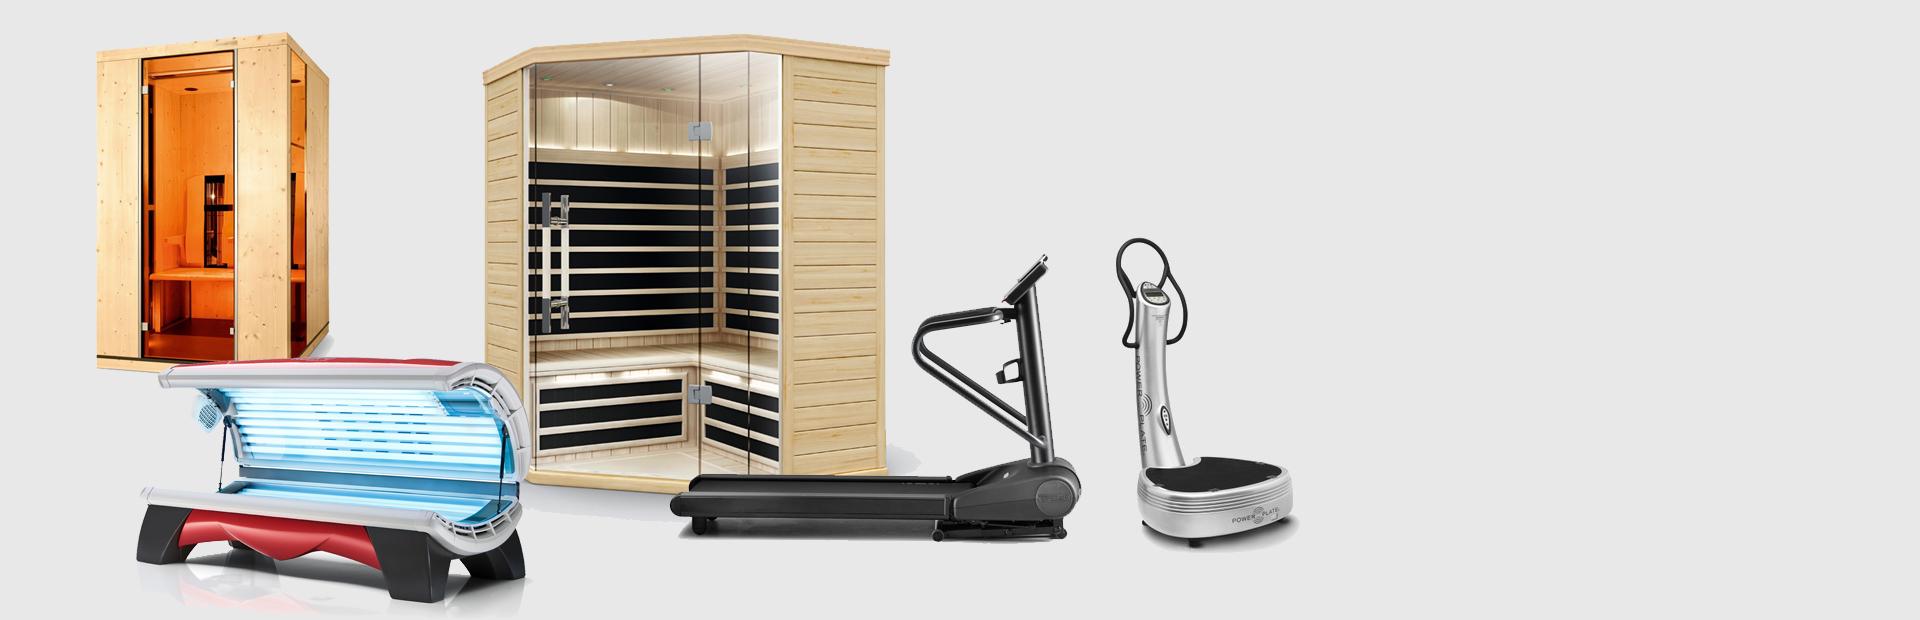 Promotion Solarium Cabine Sauna et Technogym Luxembourg